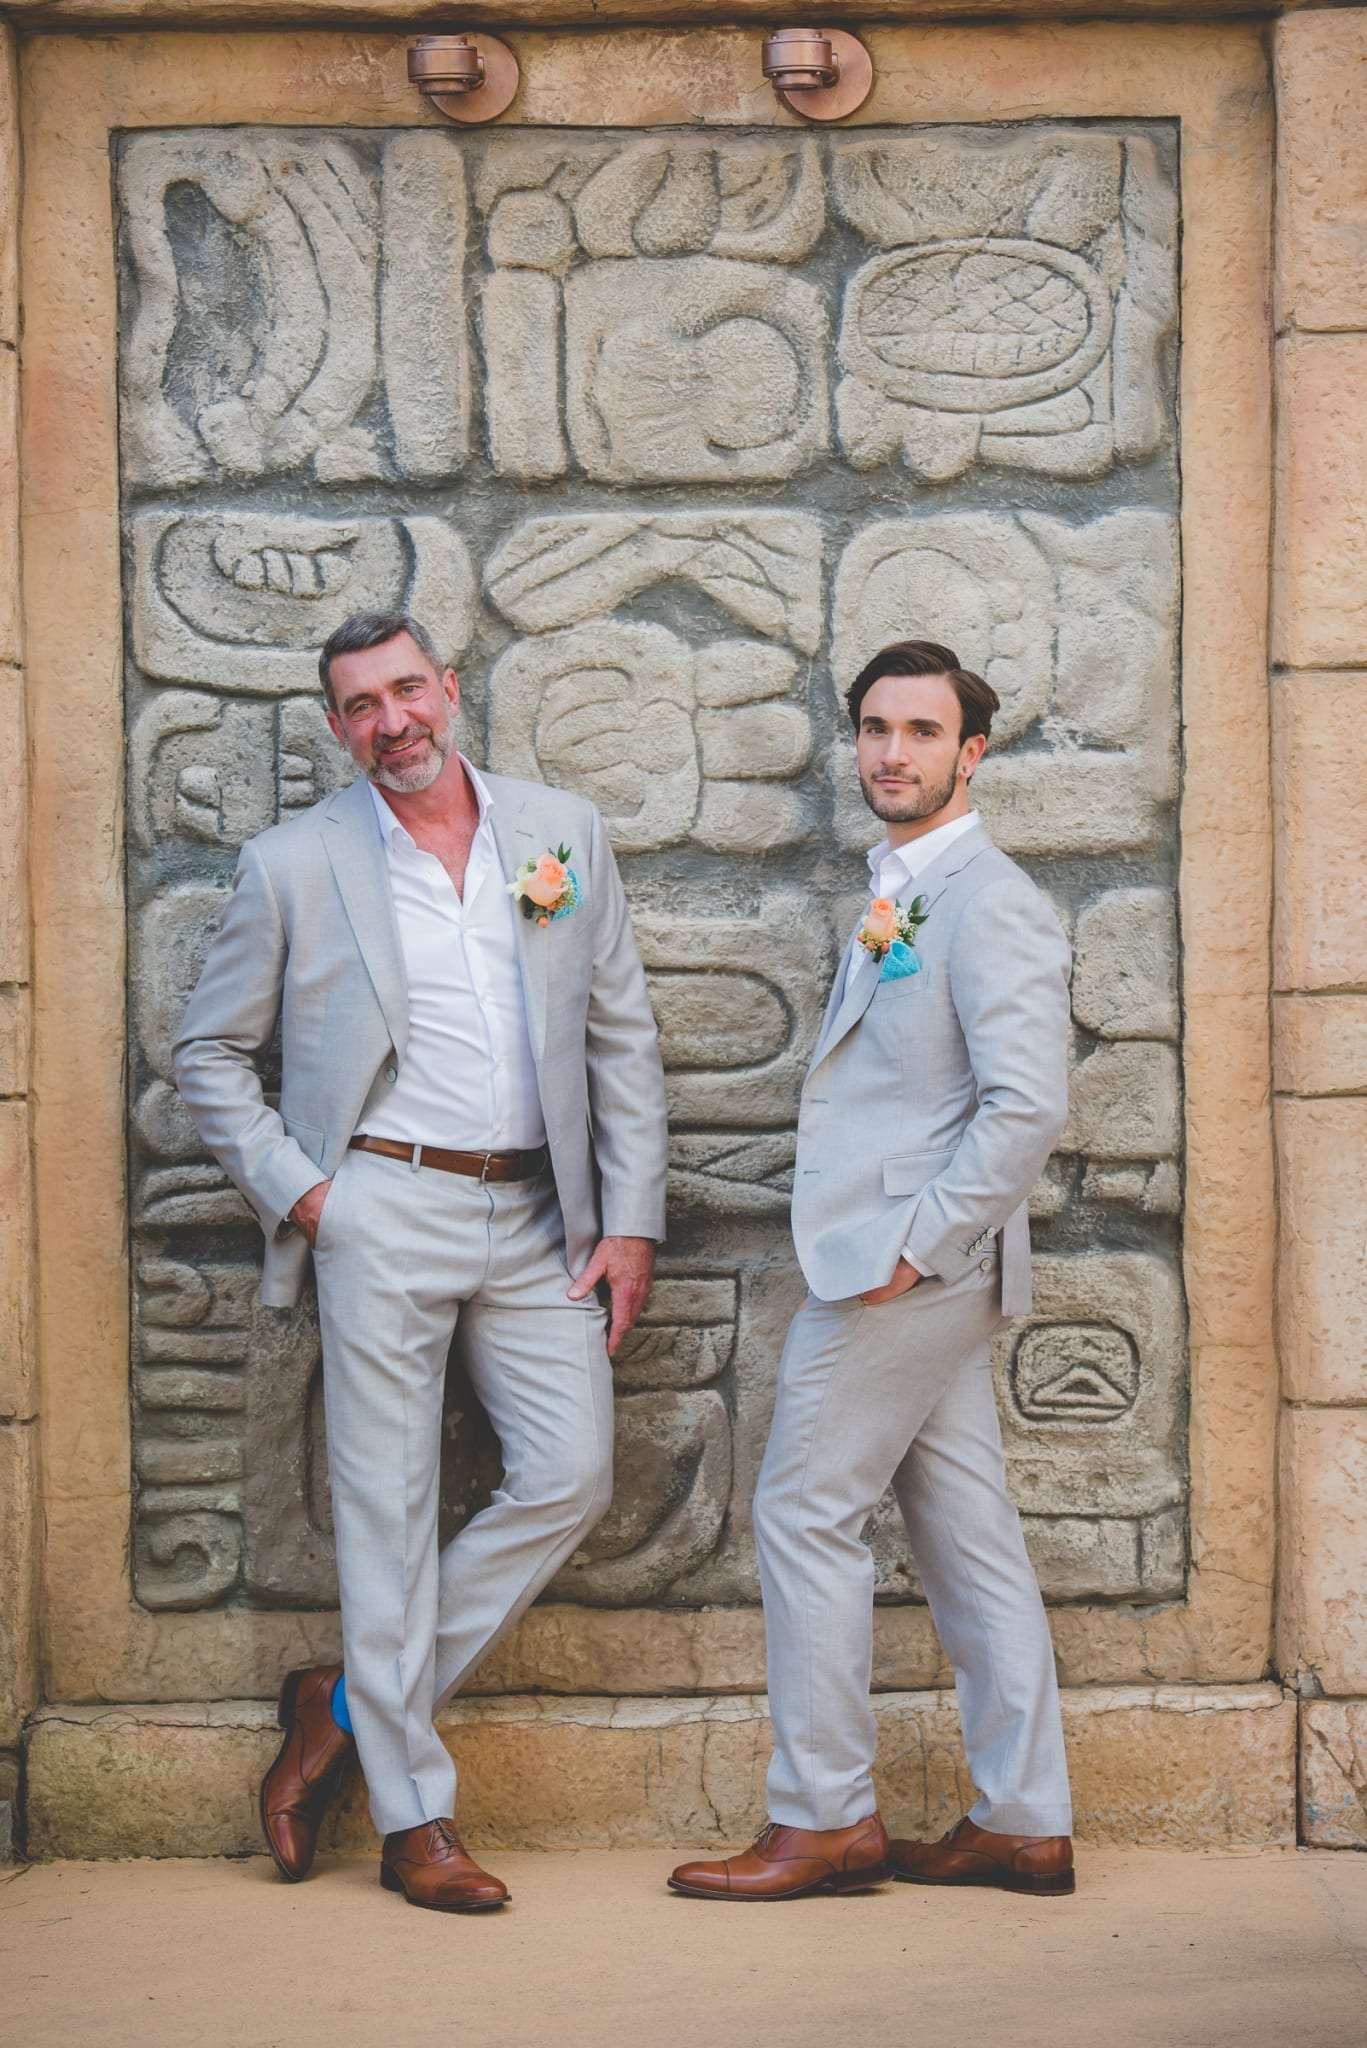 Casears wedding at atlantic city